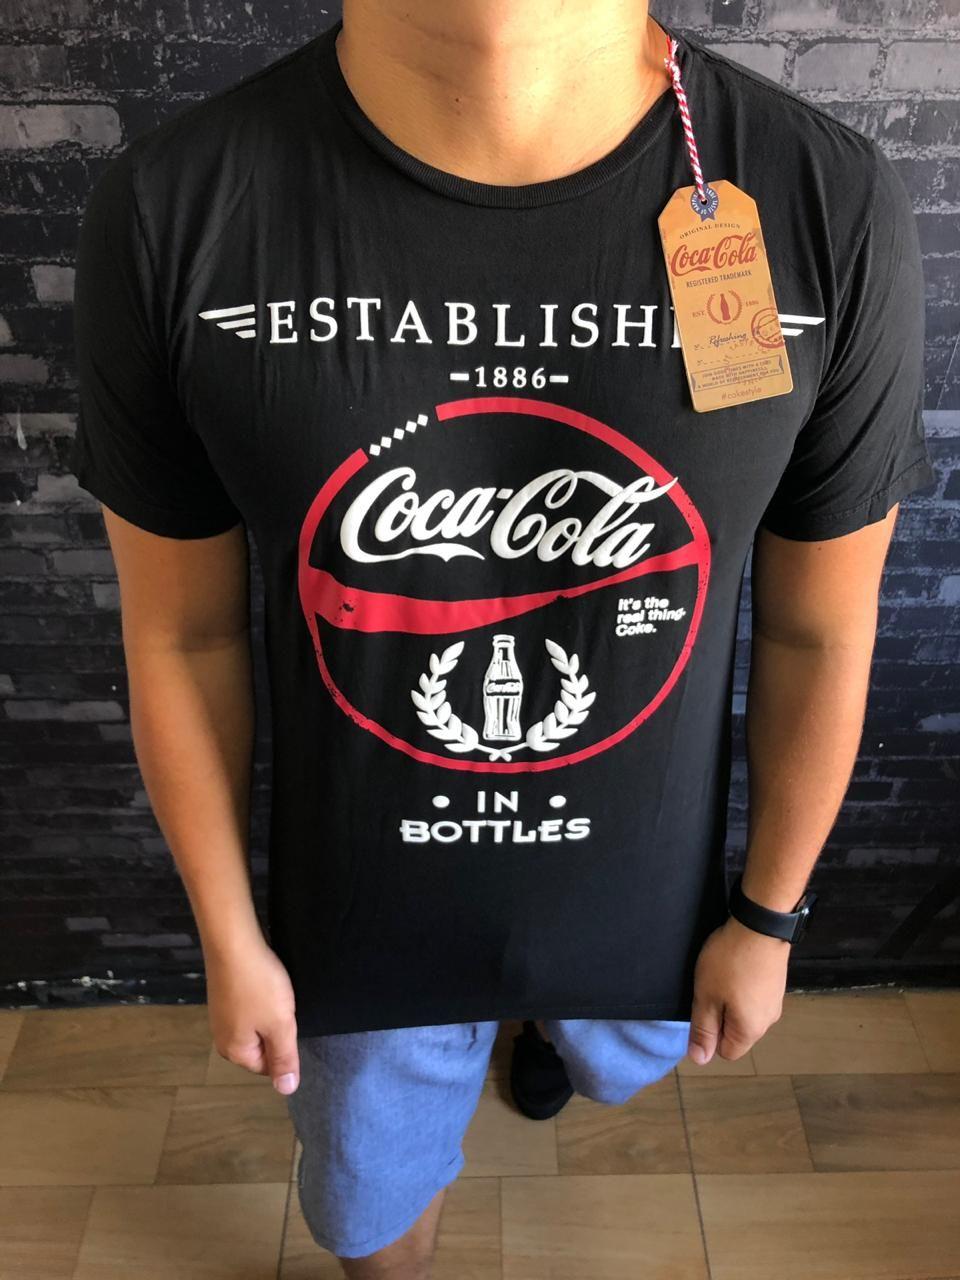 5d1270218 kit 10 Camisetas Camisas Masculinas Marcas Famosas ATACADO   Nesse kit de  camisas masculinas atacado